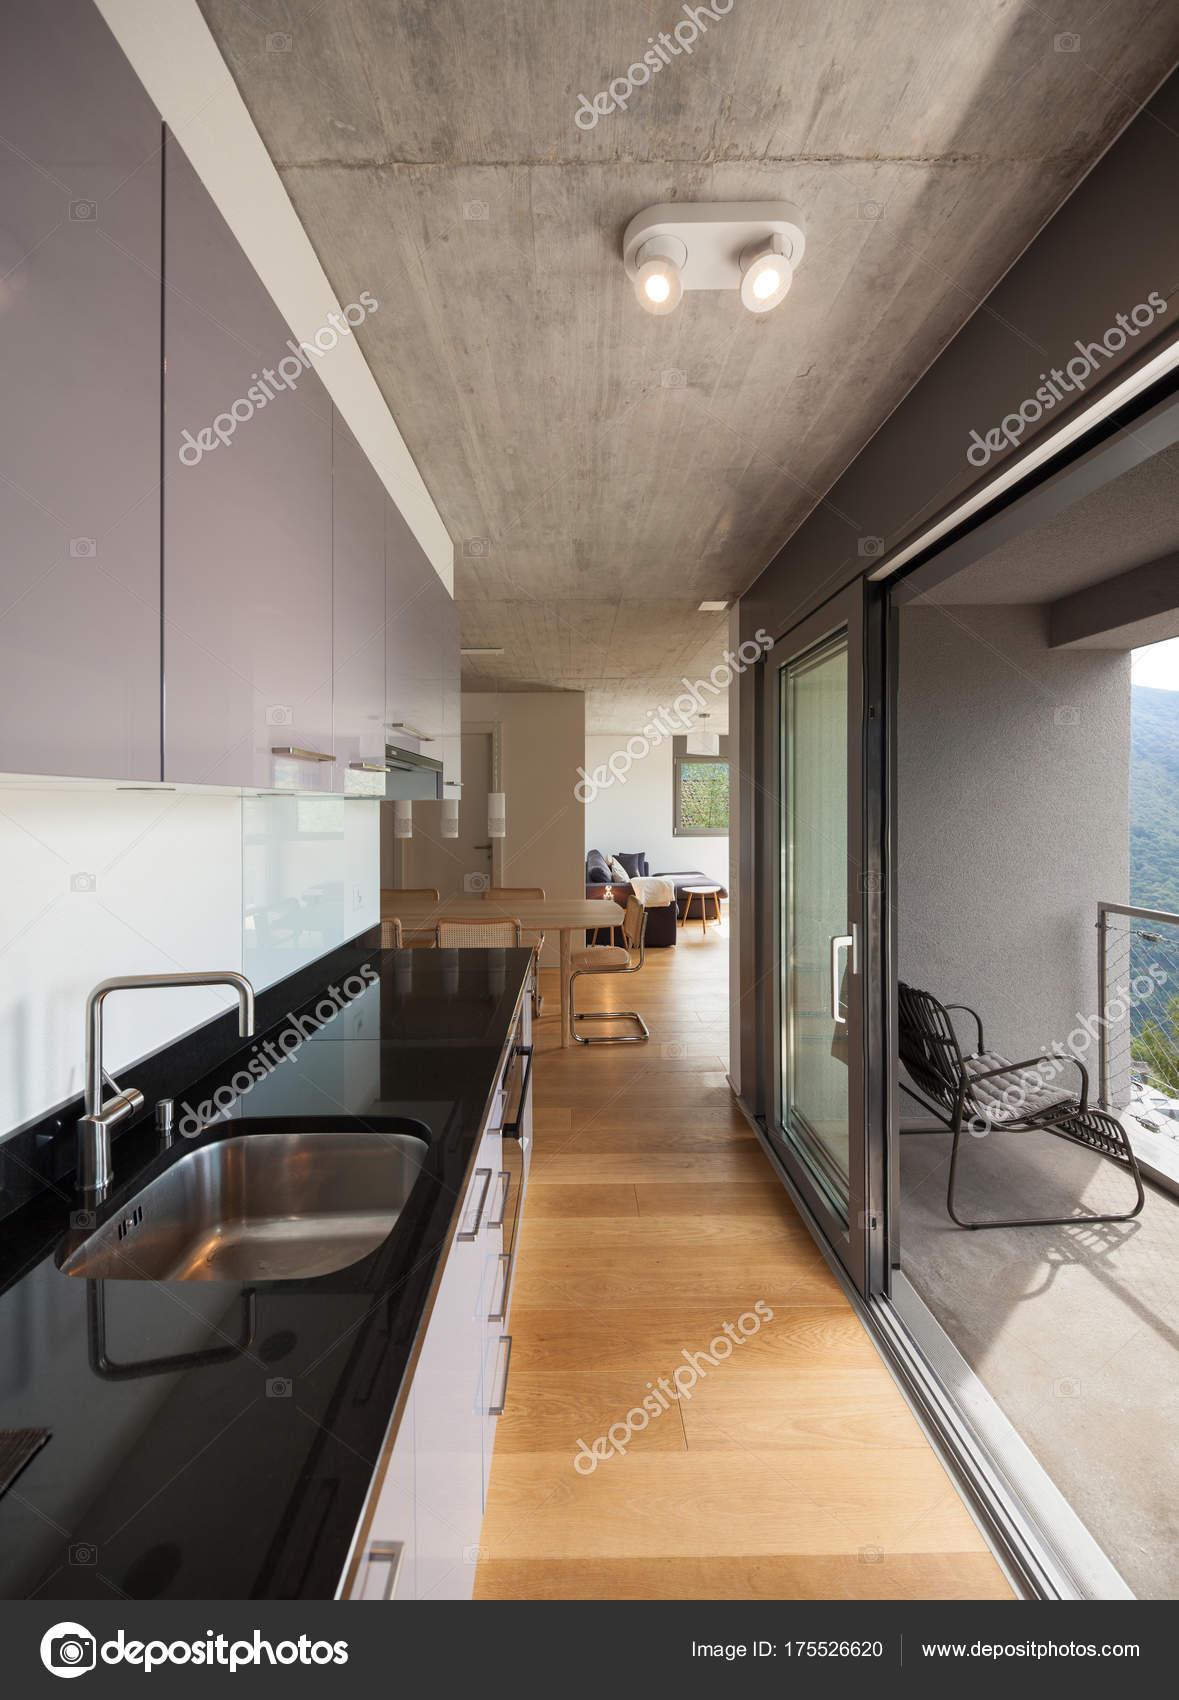 Diseno Interior Casa Moderna Casa Moderna Diseno De Interiores - Casa-de-diseo-de-interiores